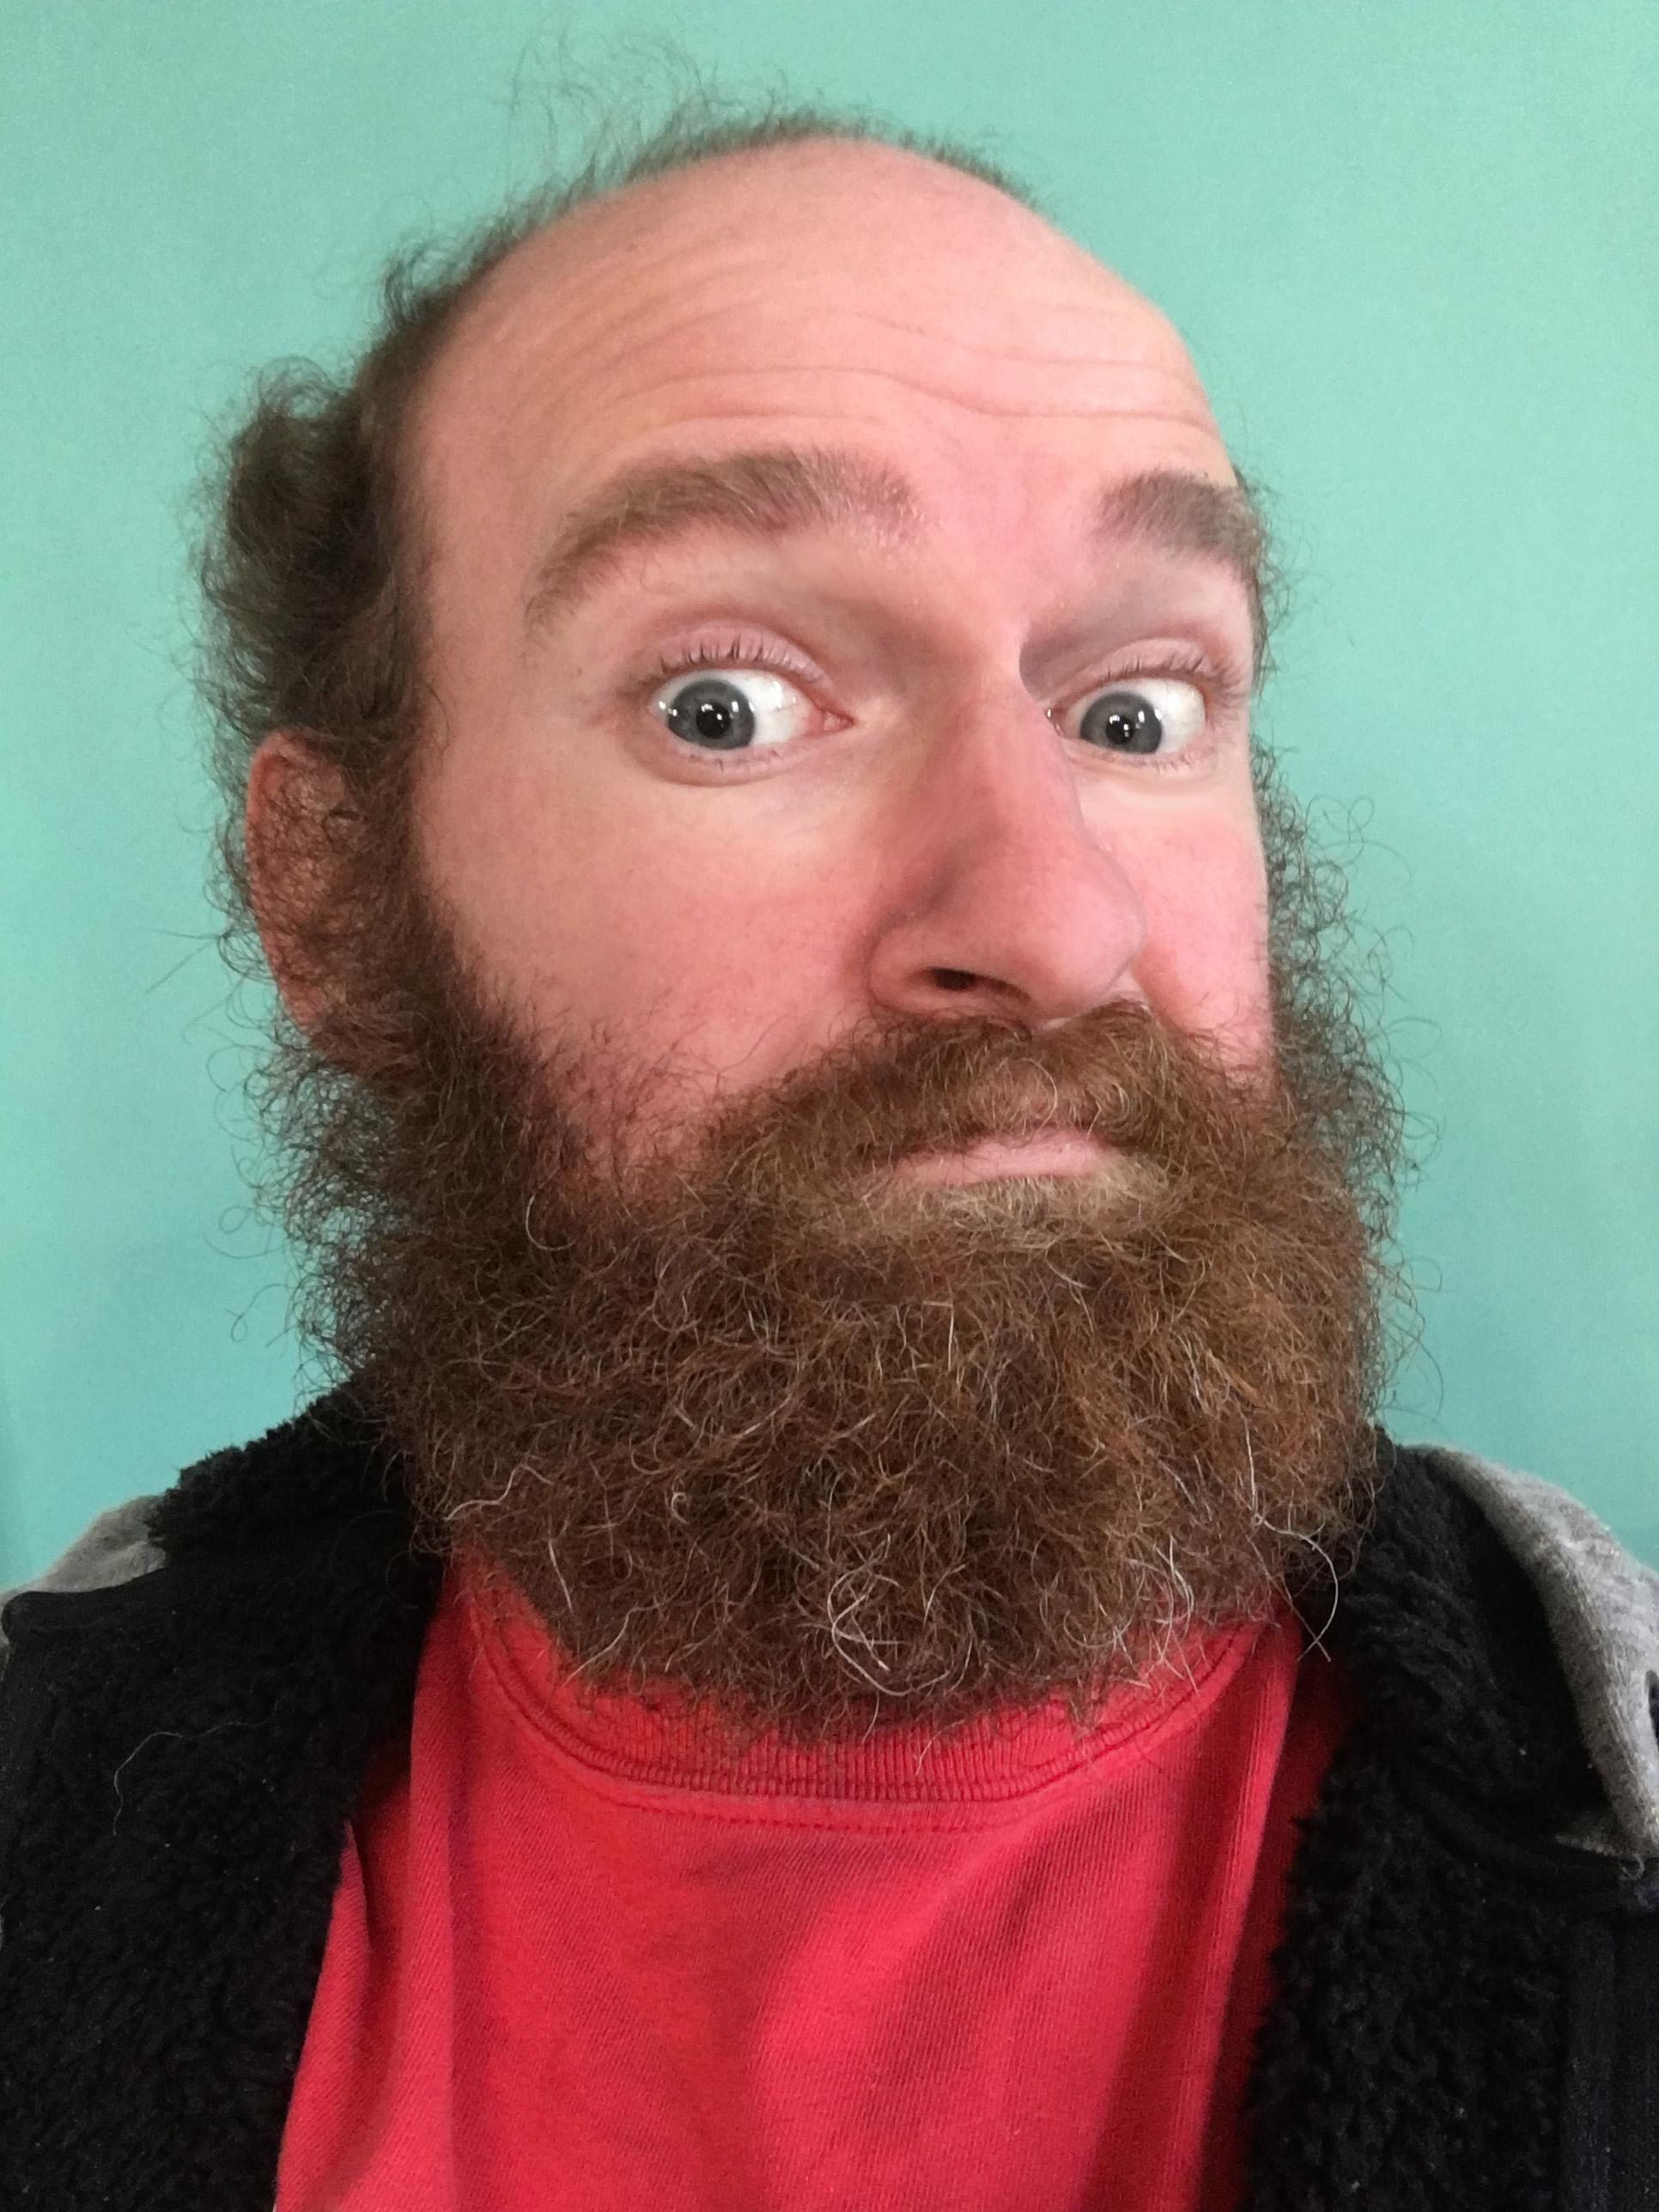 beard science 1.jpg